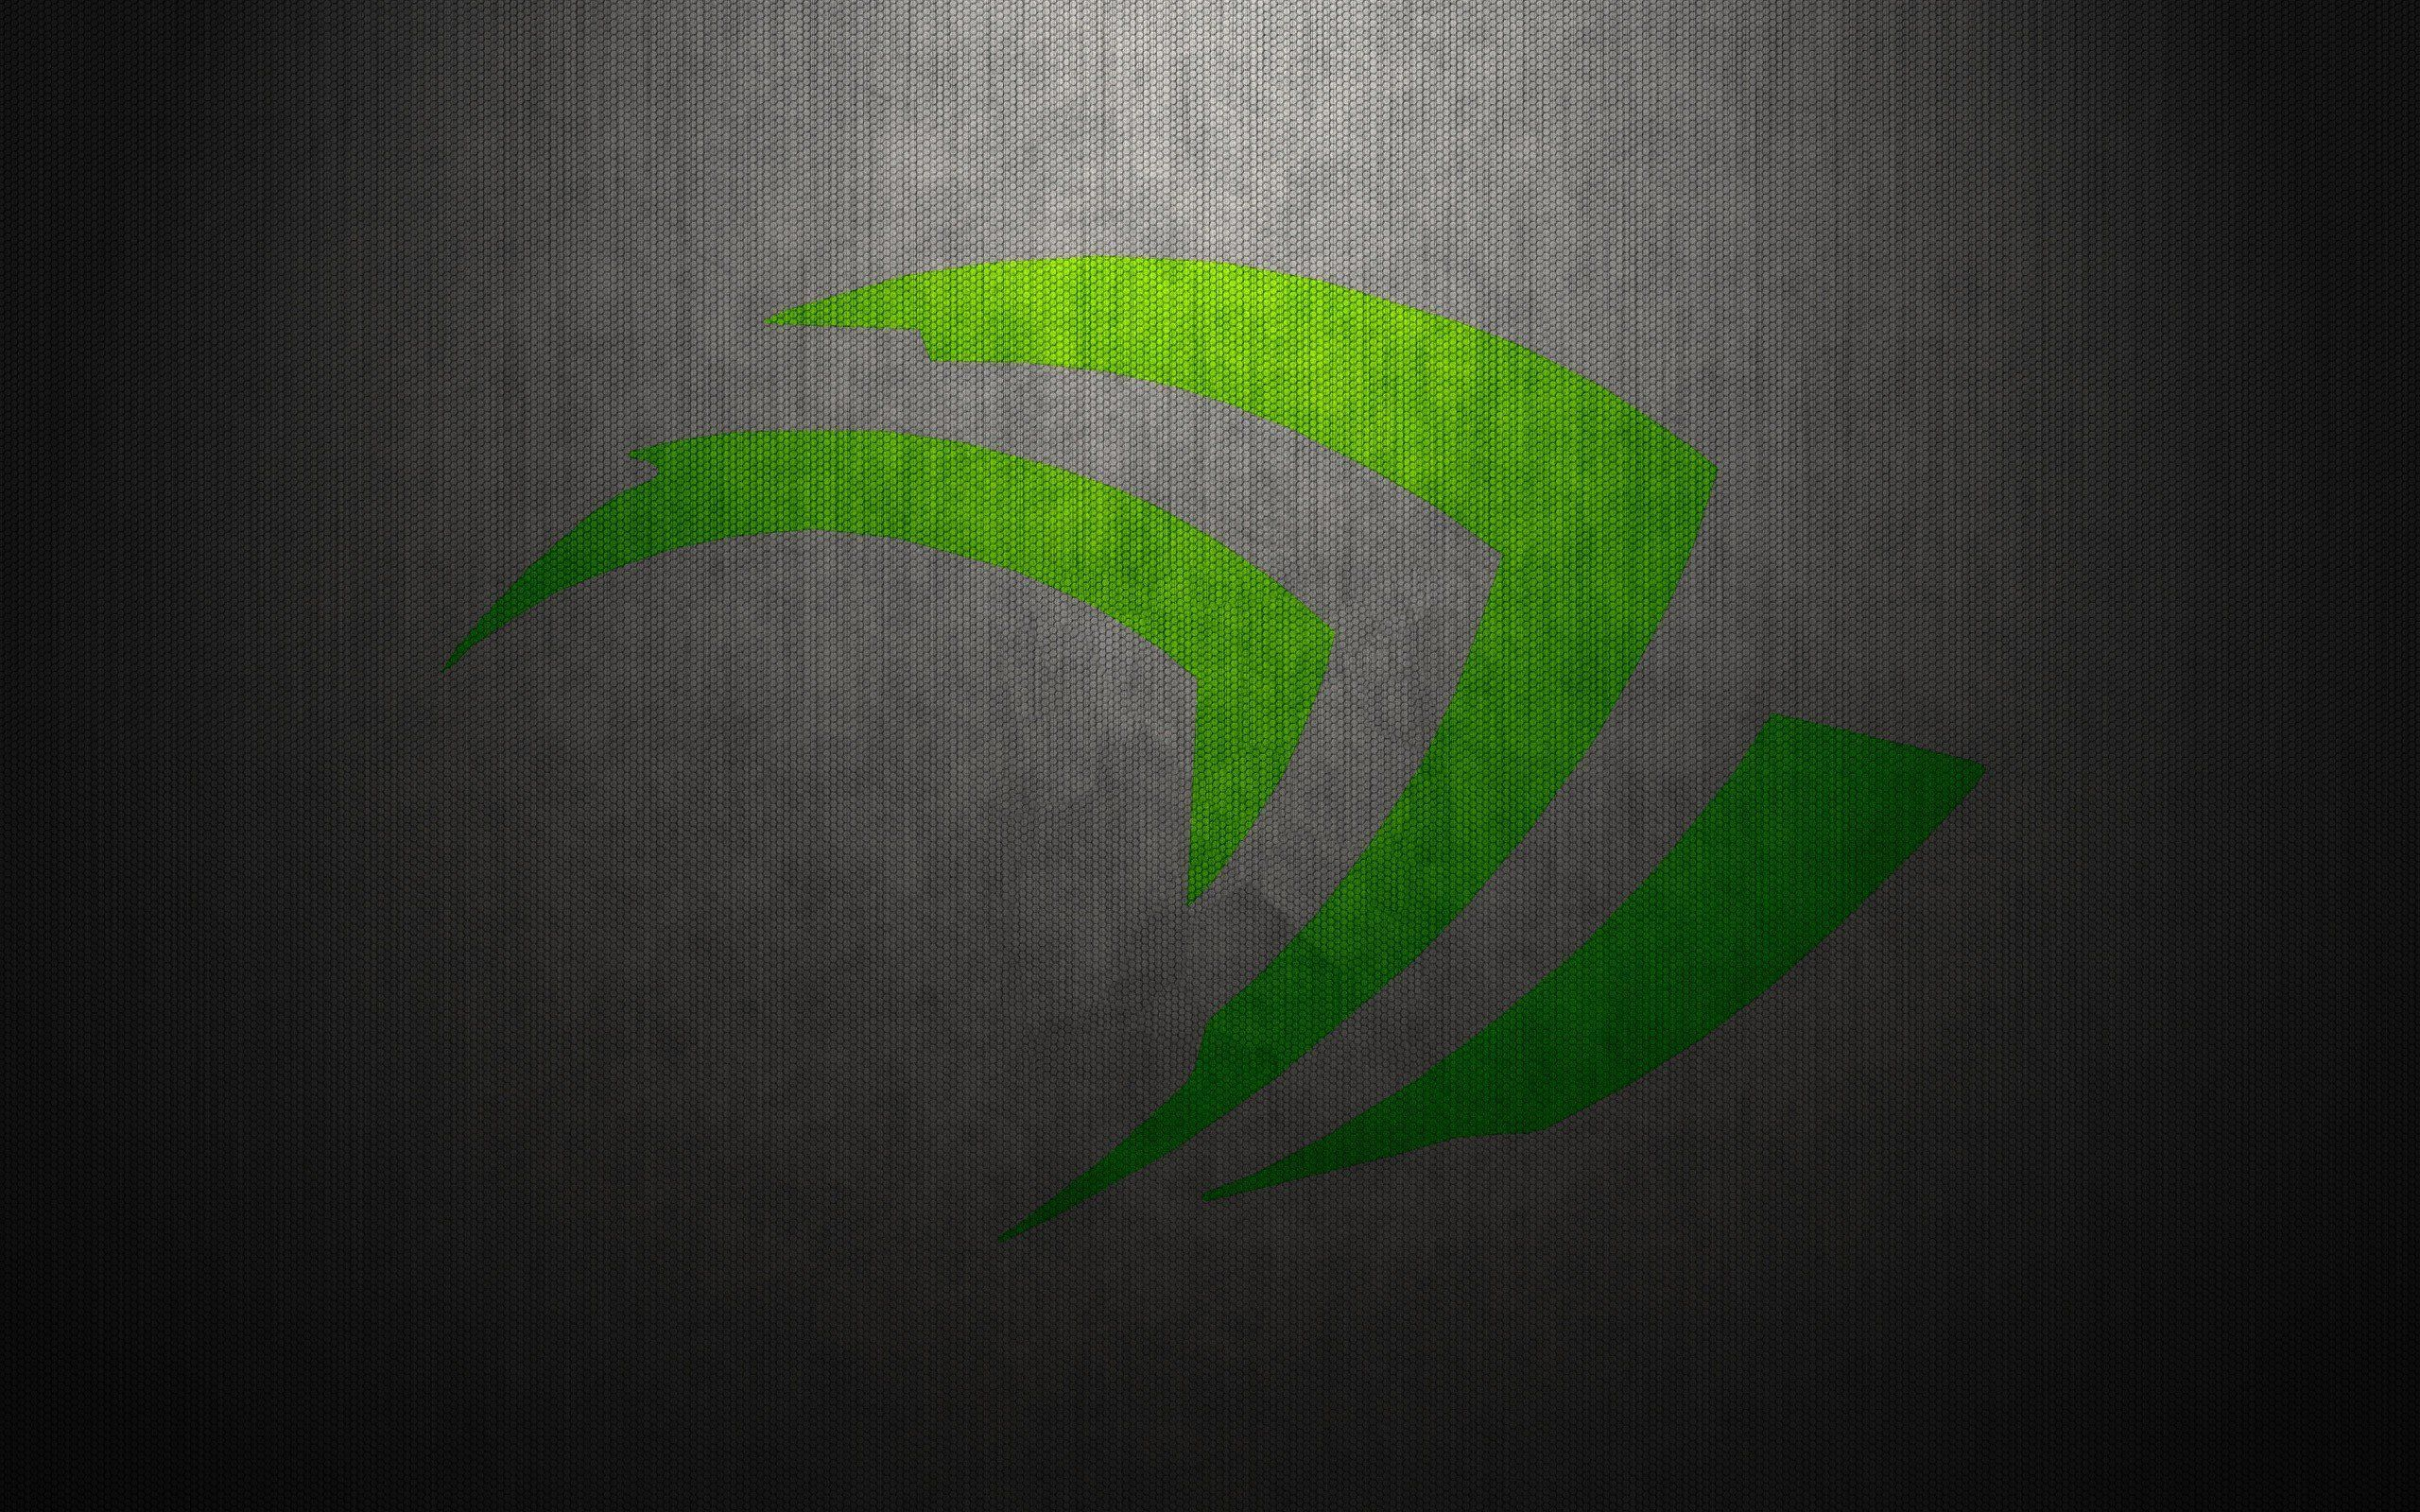 Xbox One X 4k Magic: Top Free 4K Xbox 360 Backgrounds